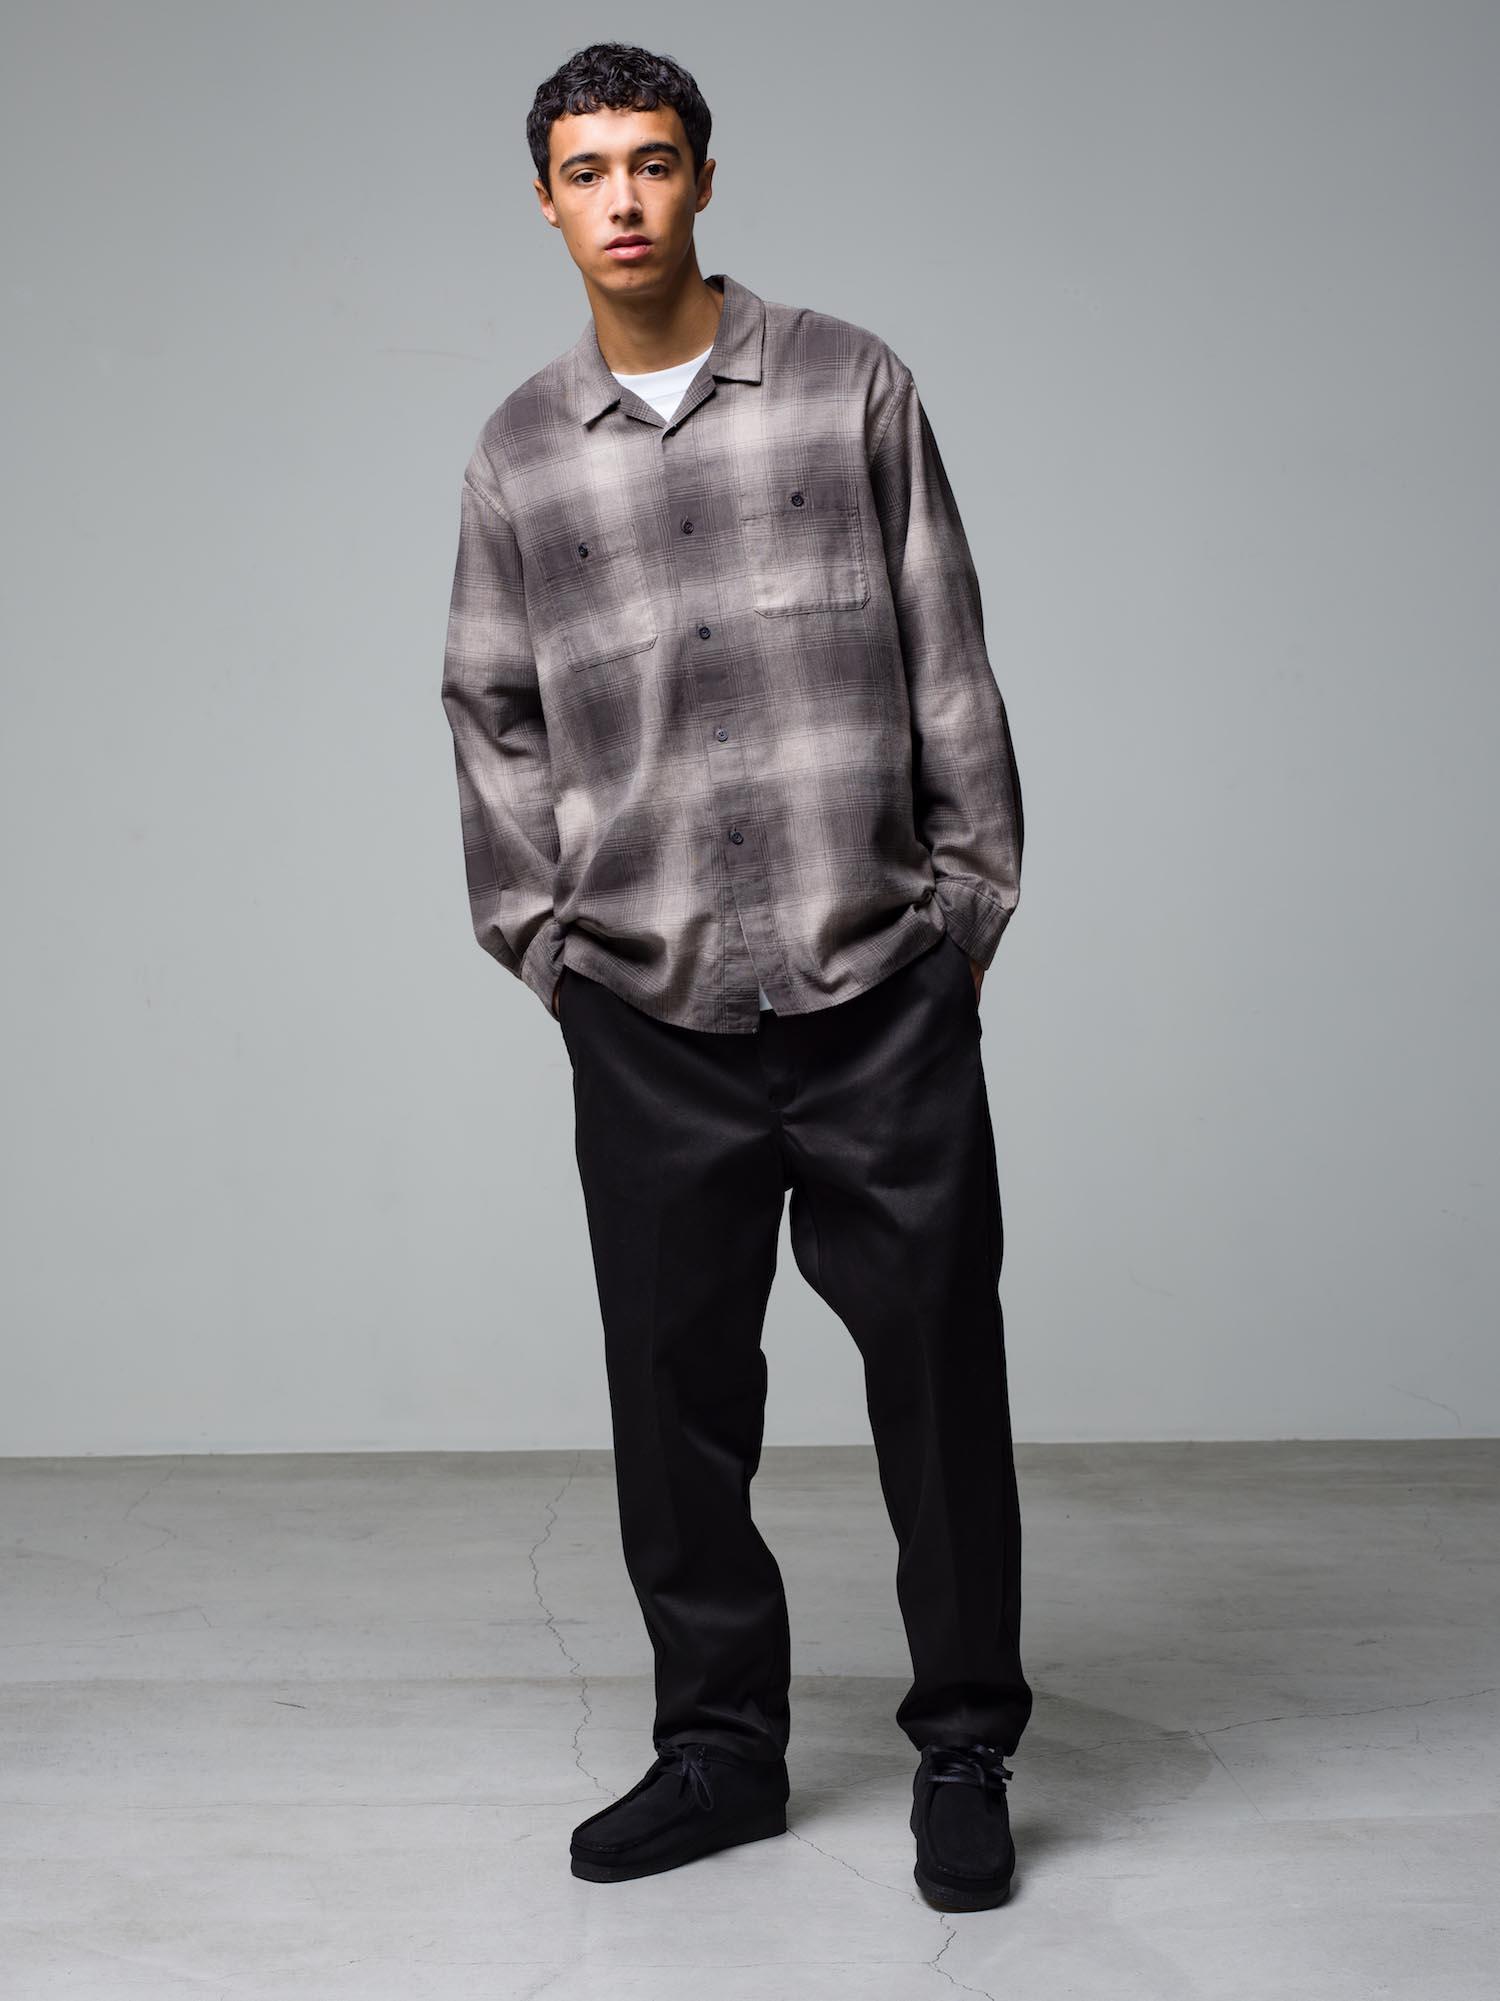 31) L/S Shirt ¥36,300  Inner ¥8,800  Pants ¥22,000  Shoes ¥25,300